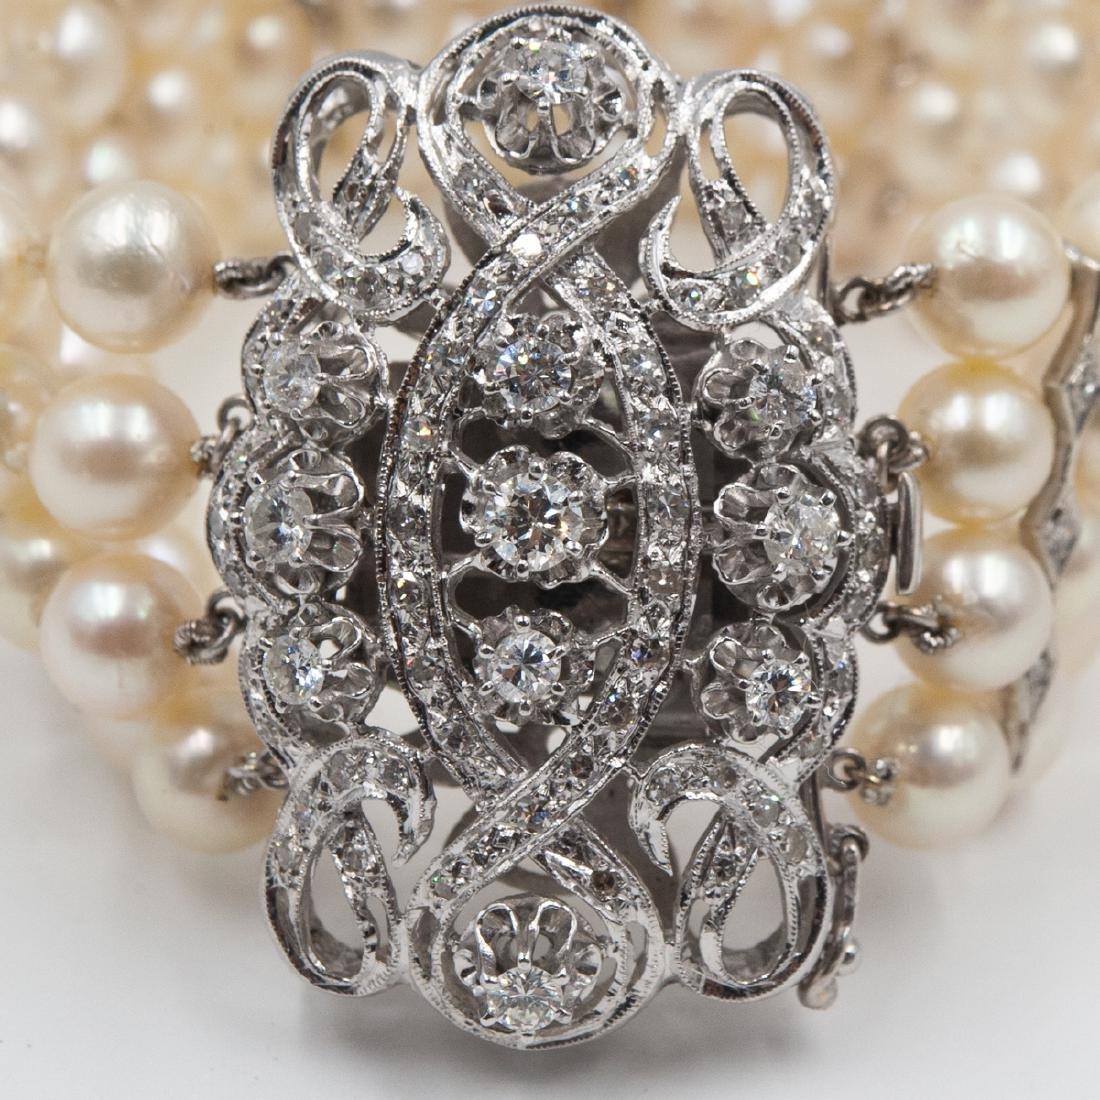 14k Gold, Diamond and Pearl Bracelet - 2